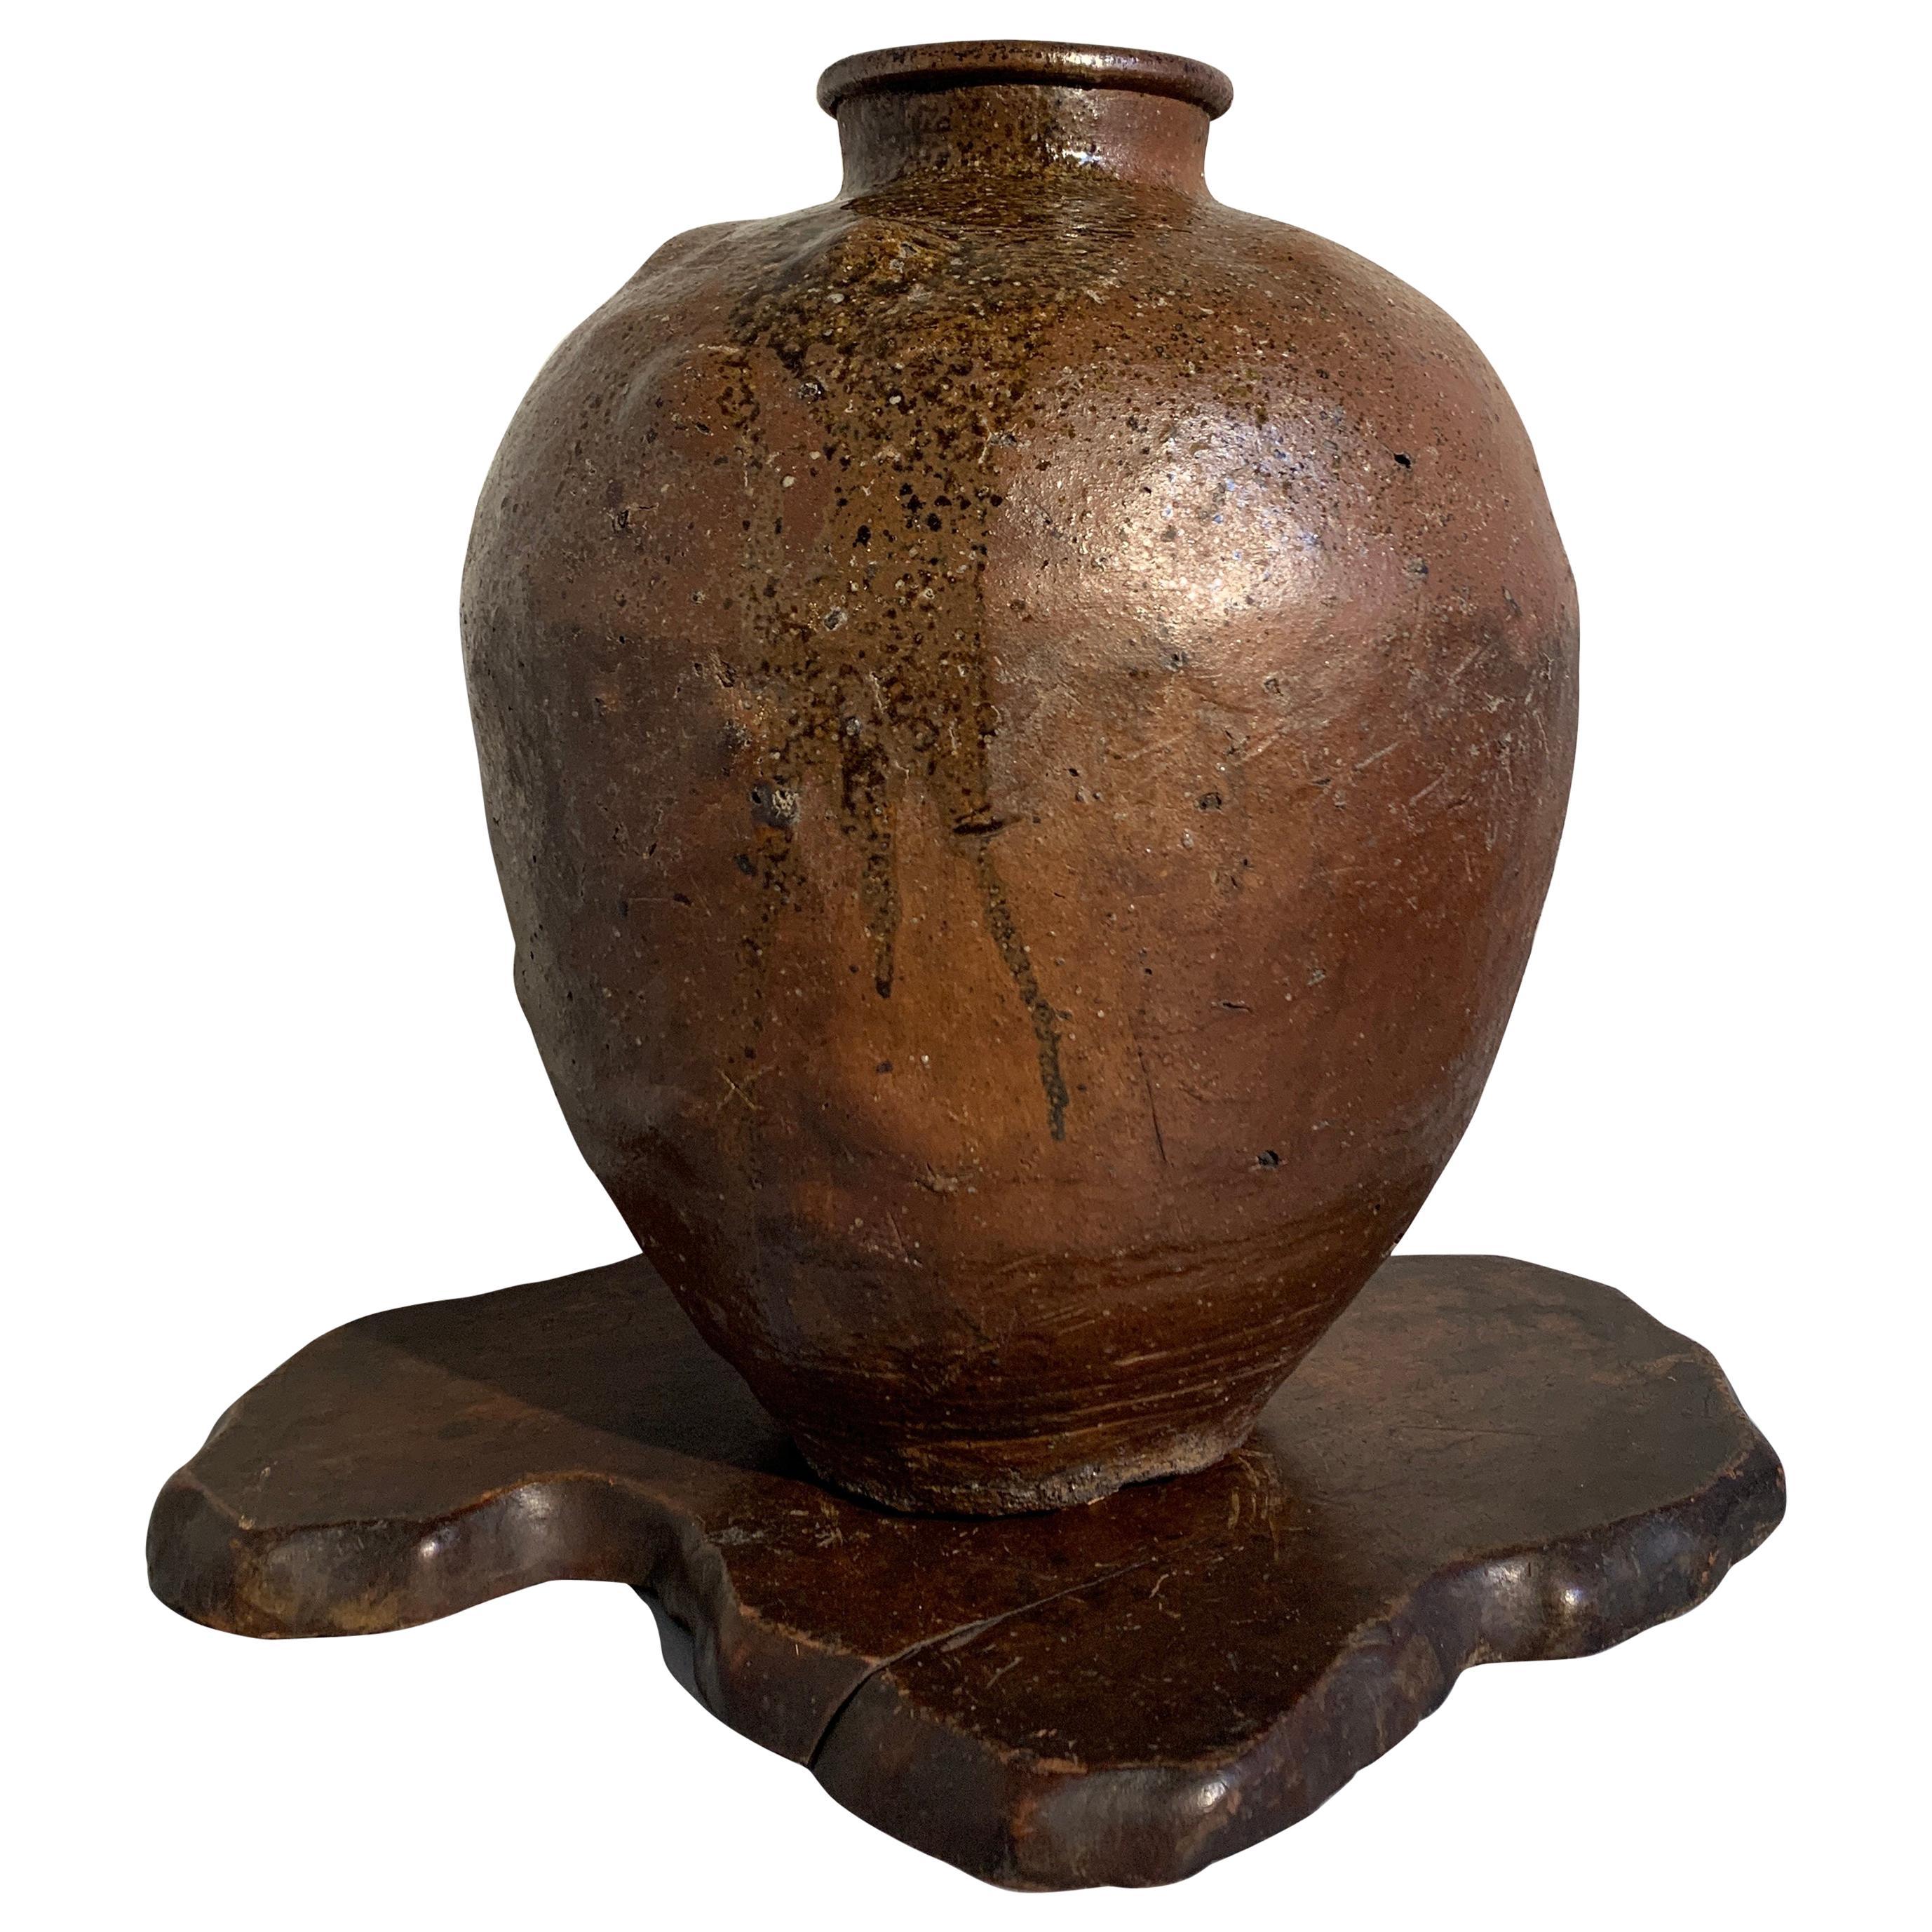 Japanese Shigaraki Large Storage Jar, Tsubo, Muromachi to Edo Period, circa 1600